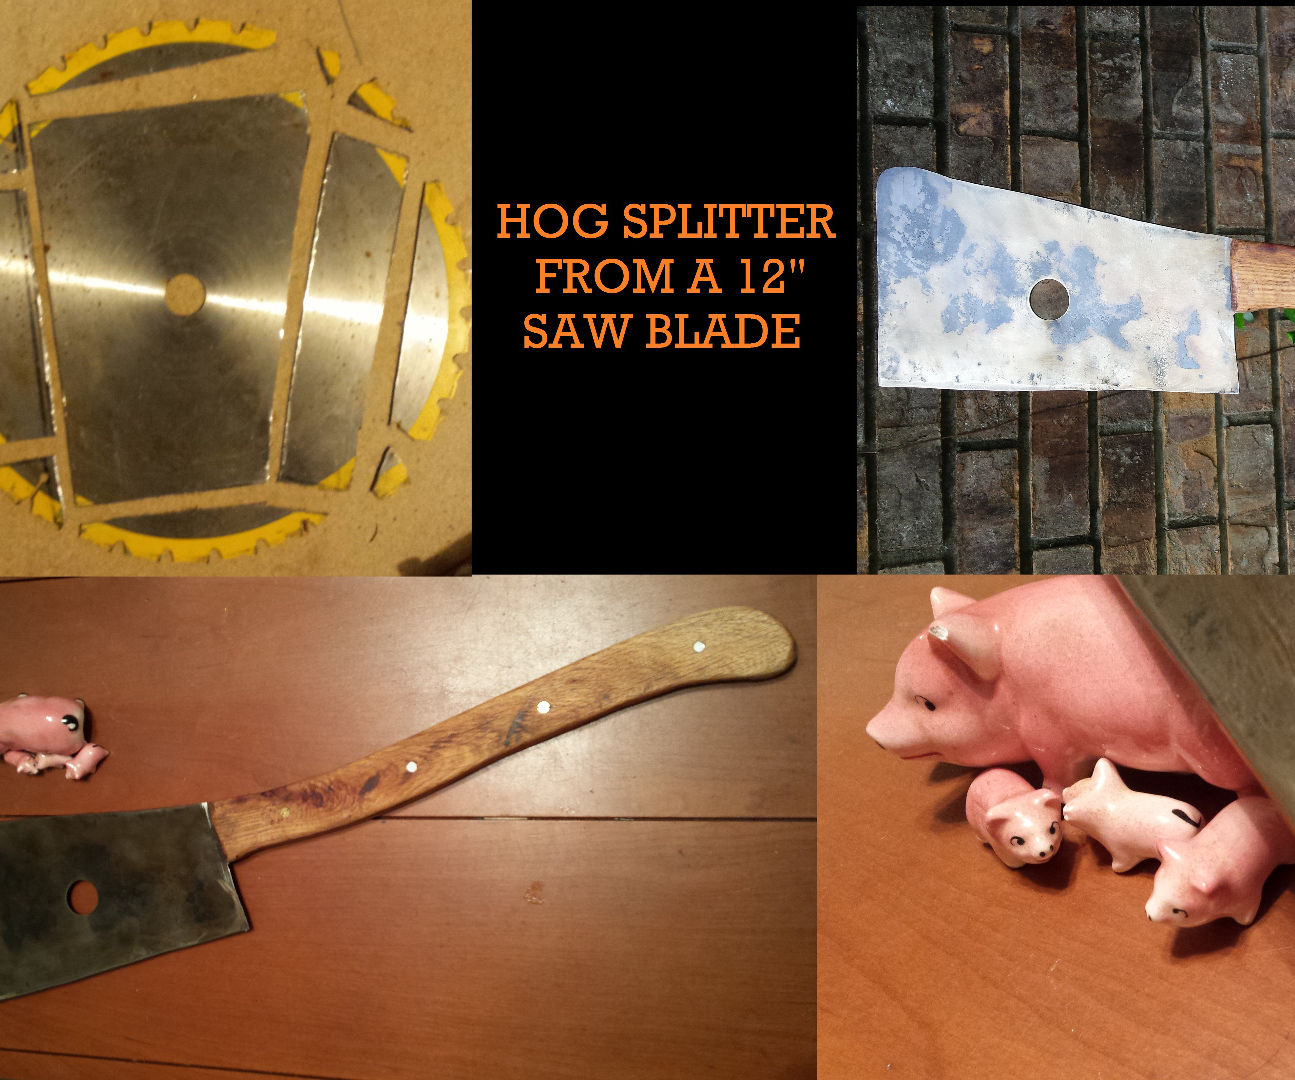 "Hog Splitter from a 12"" Saw Blade"